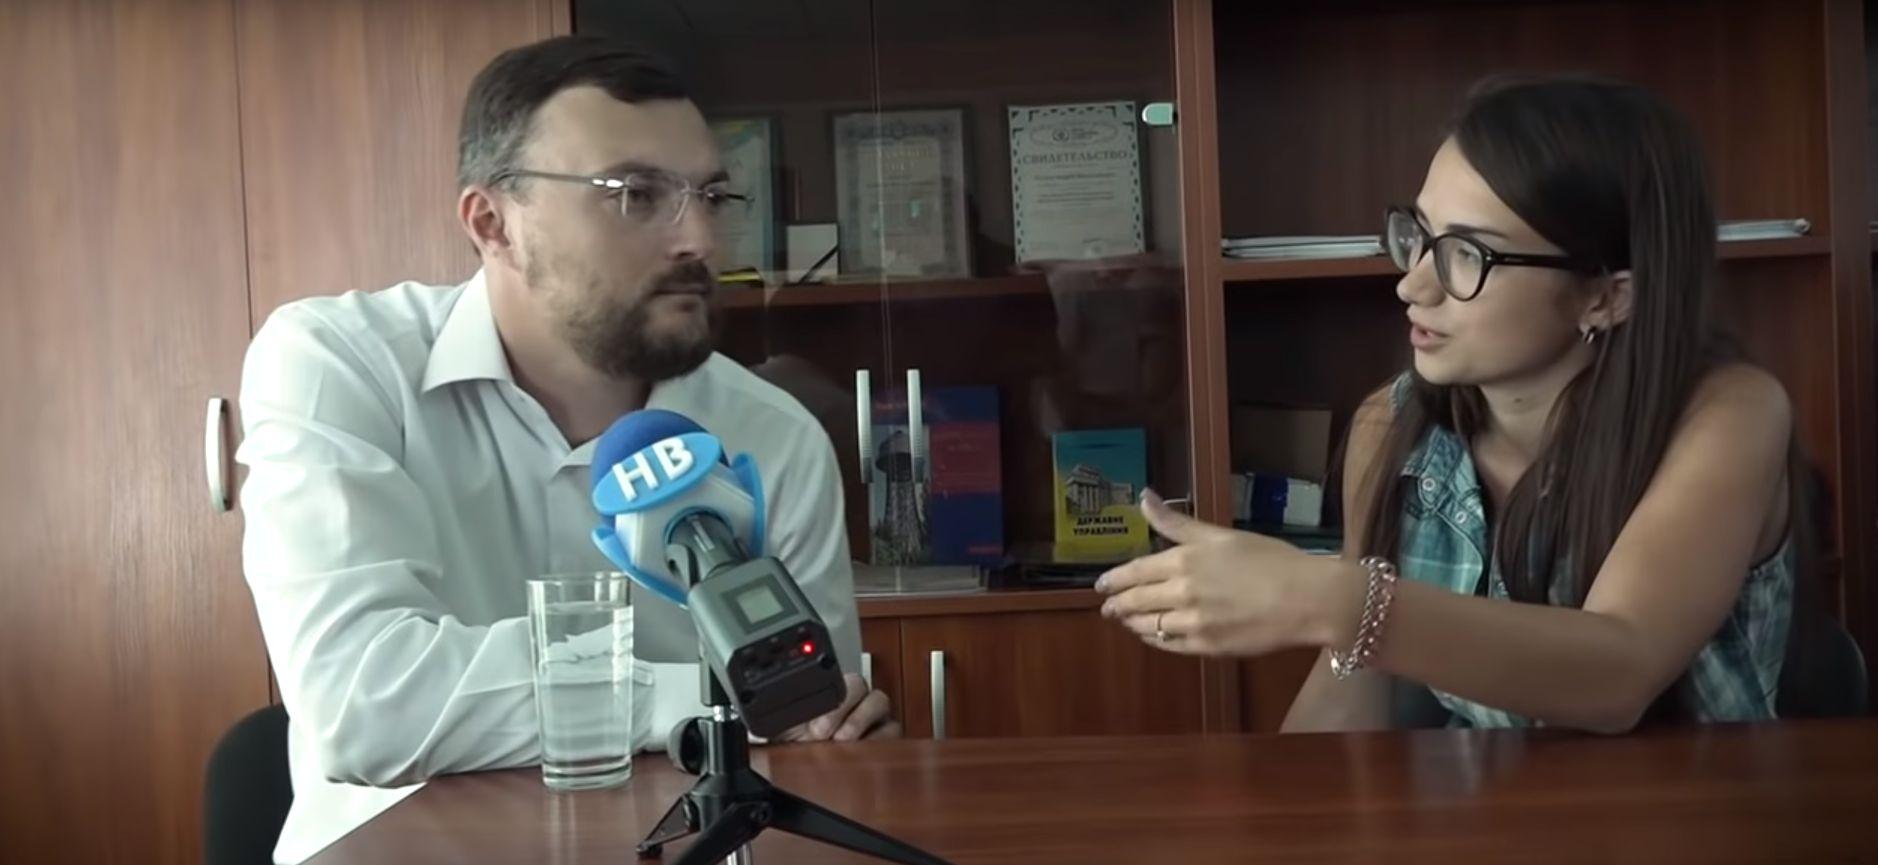 Дятлов раскритиковал мэра Сенкевича и заявил о кризисе в Николаеве (ВИДЕО)